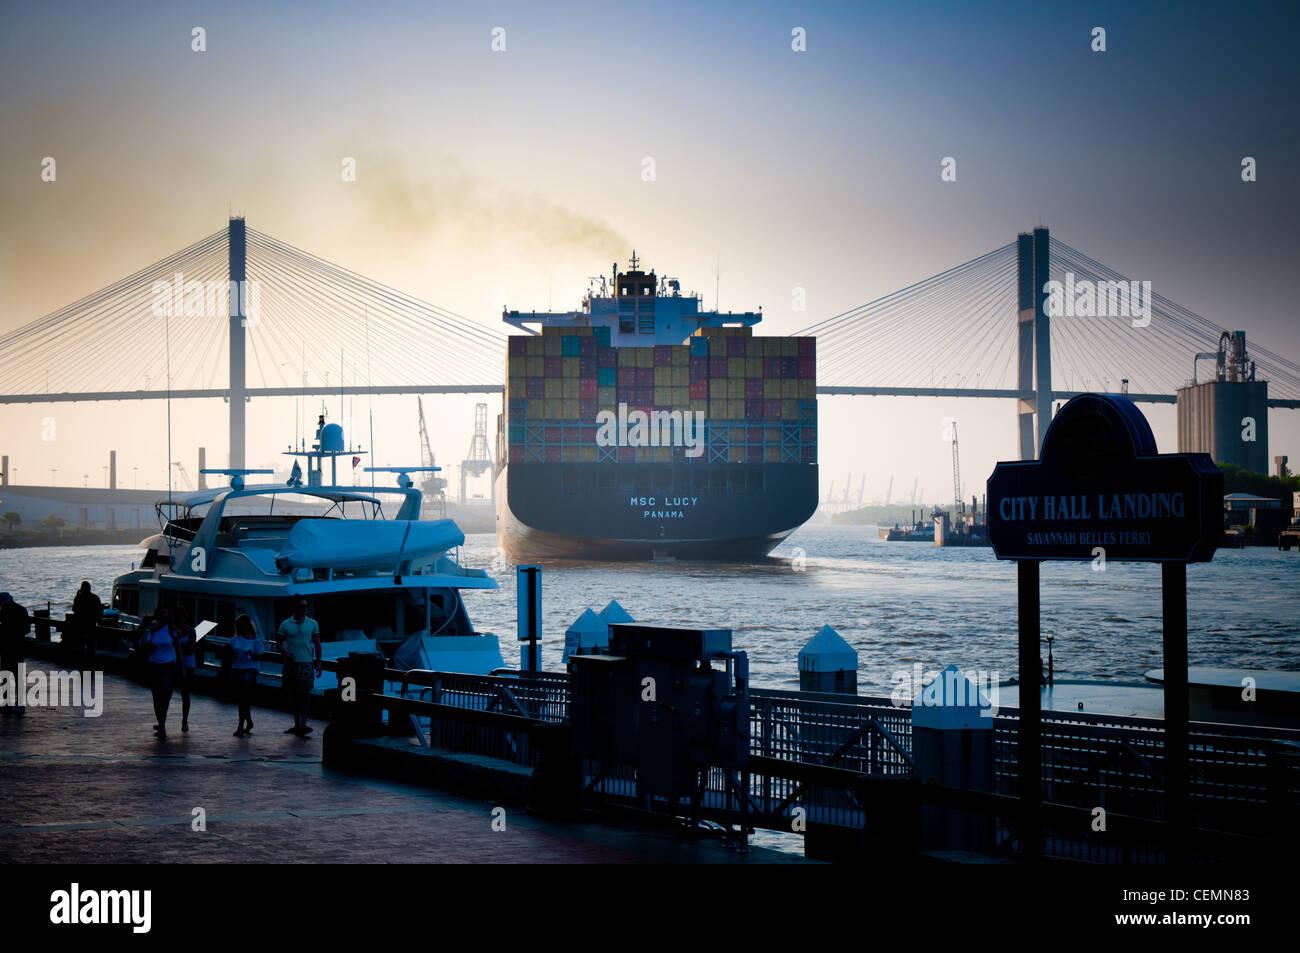 Ship going under Talmadge Memorial Bridge in Savannah, GA - Stock Image